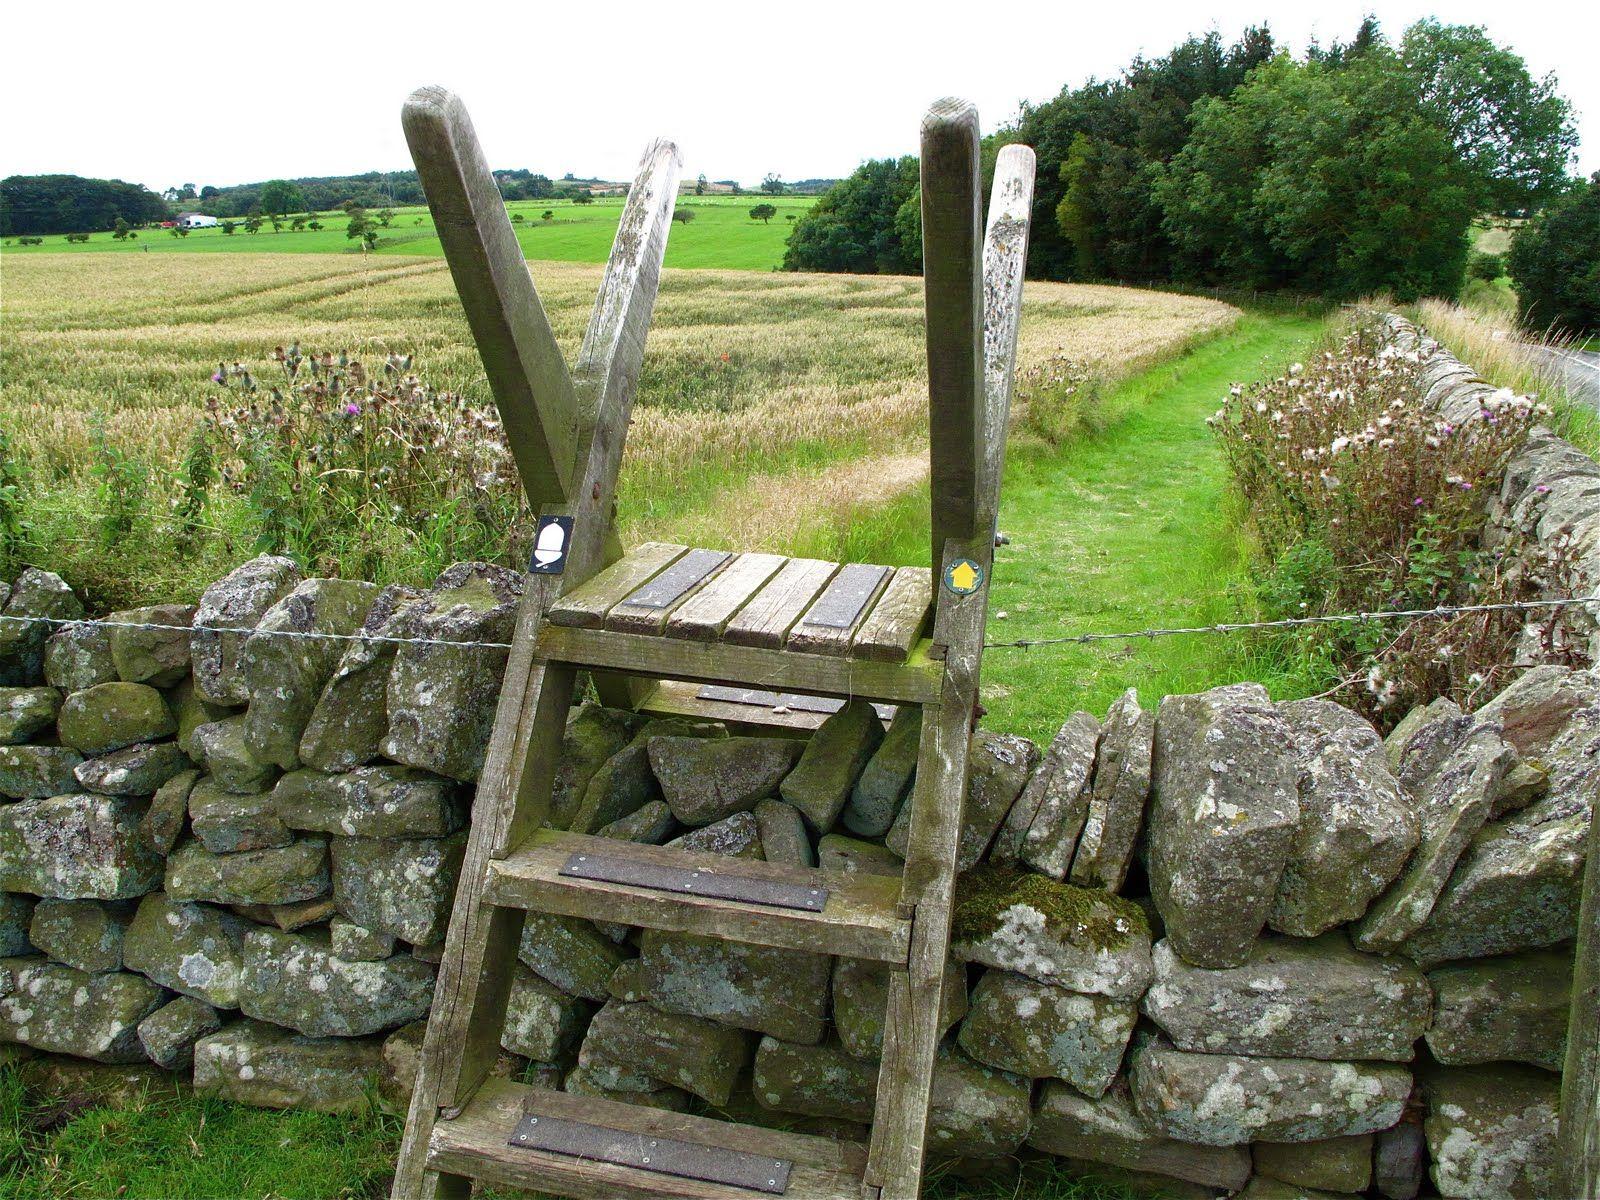 Fence stile country stiles gates and fences for Stile design